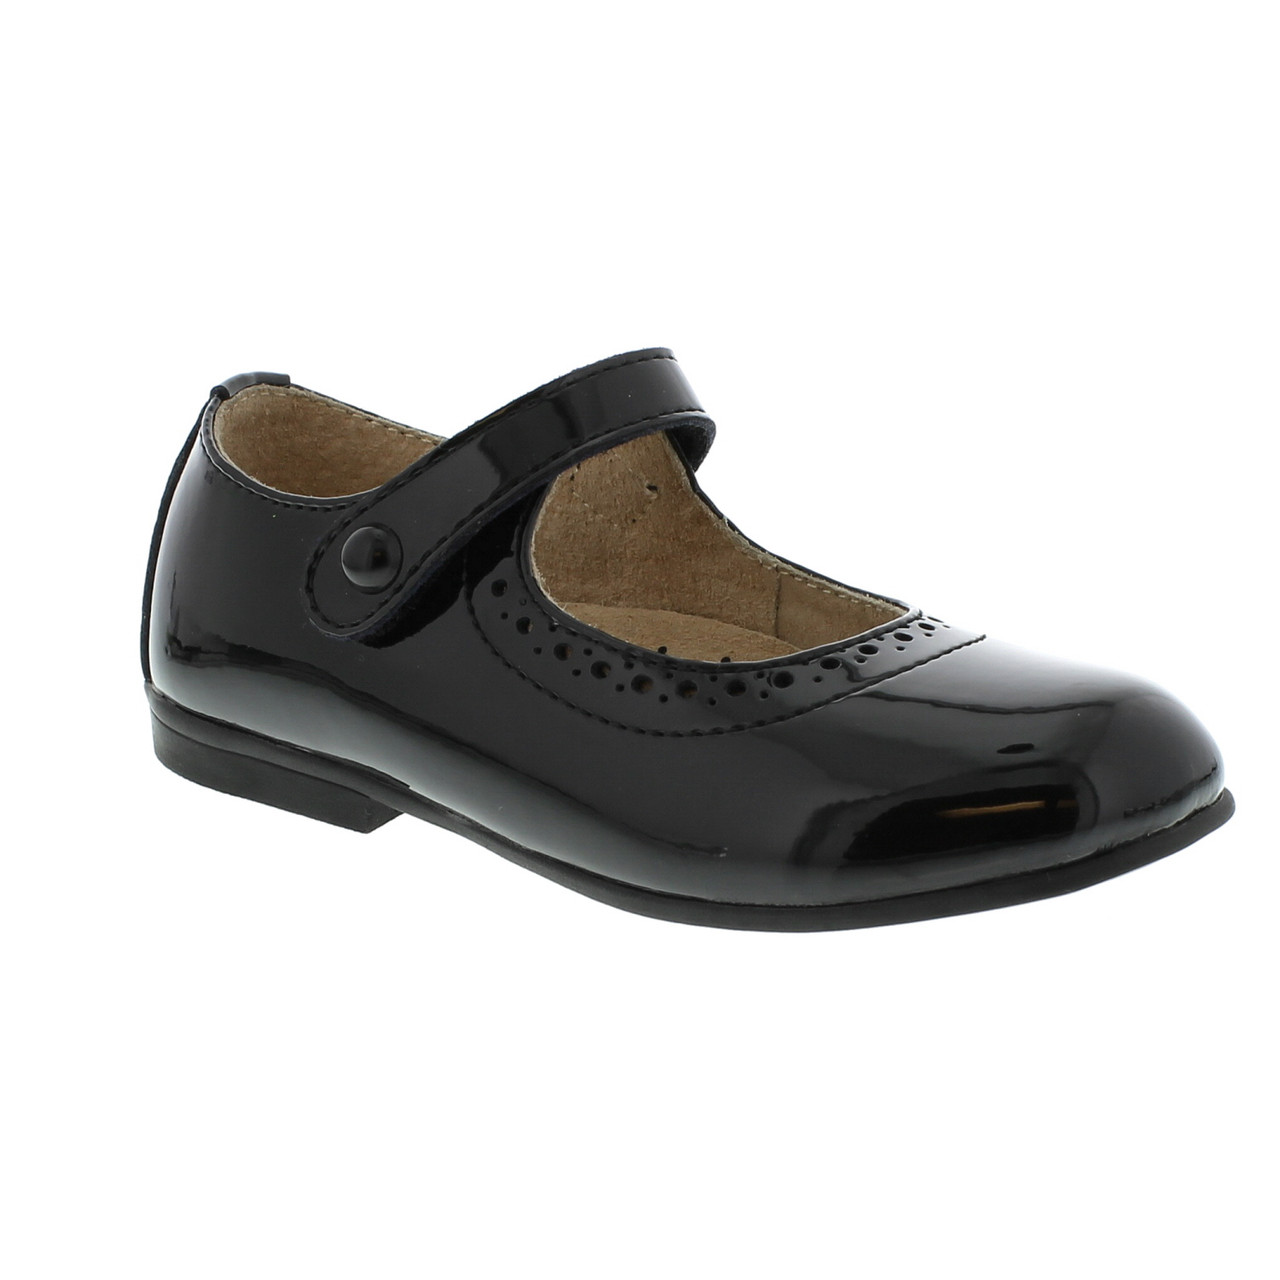 b82fe22cd9bd7 Footmates *EMMA* Black Patent Mary Jane